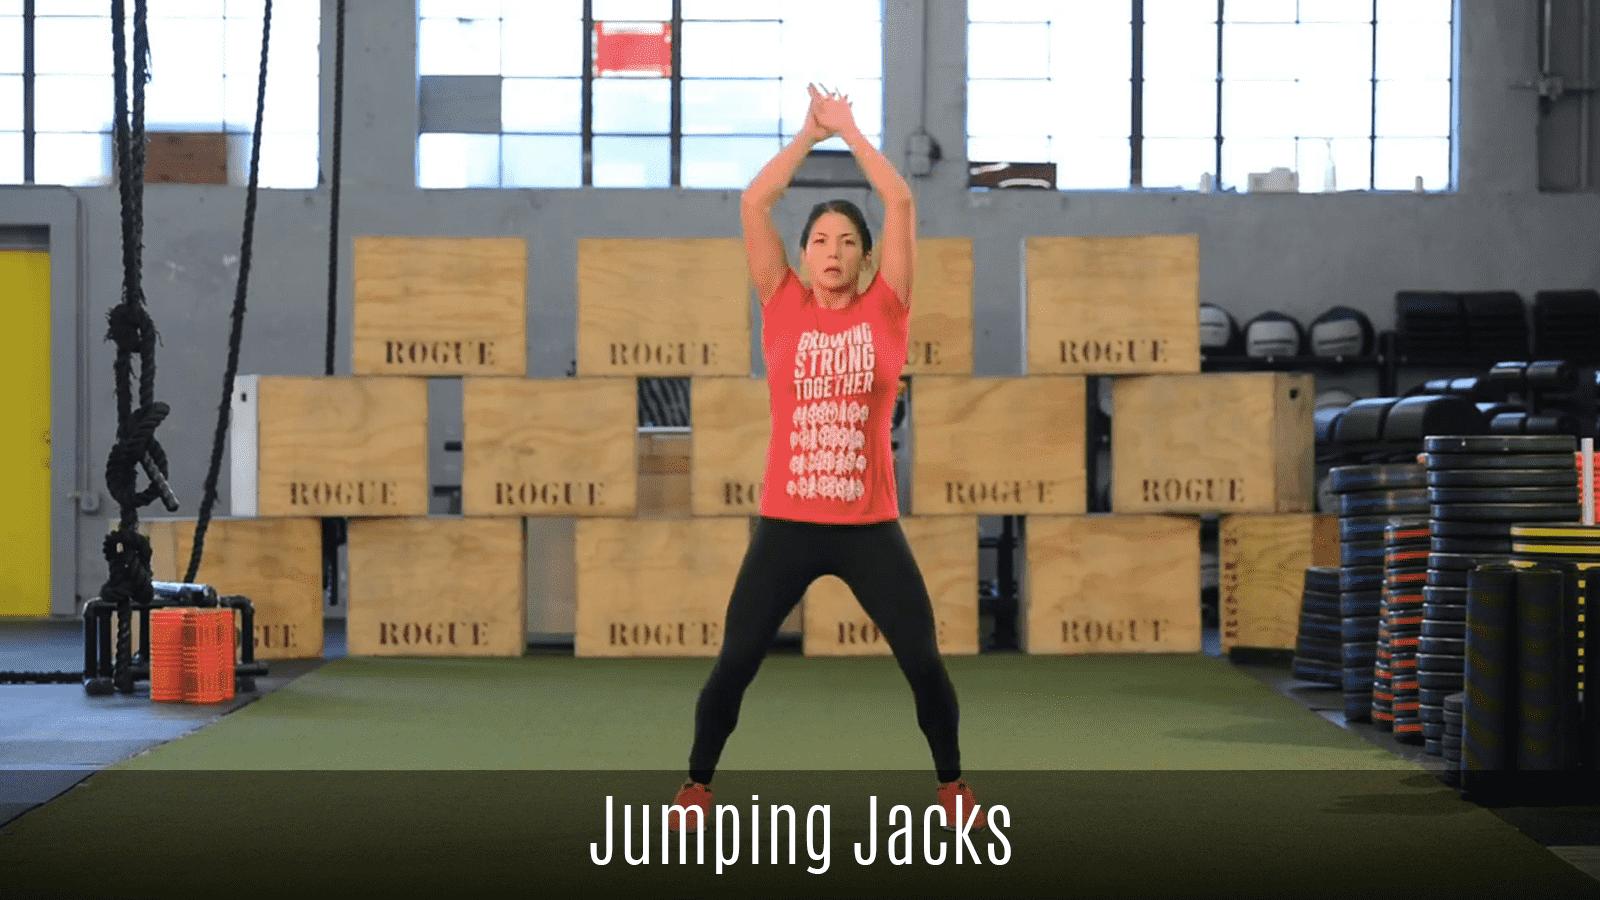 dynamic jumping jacks movement demo